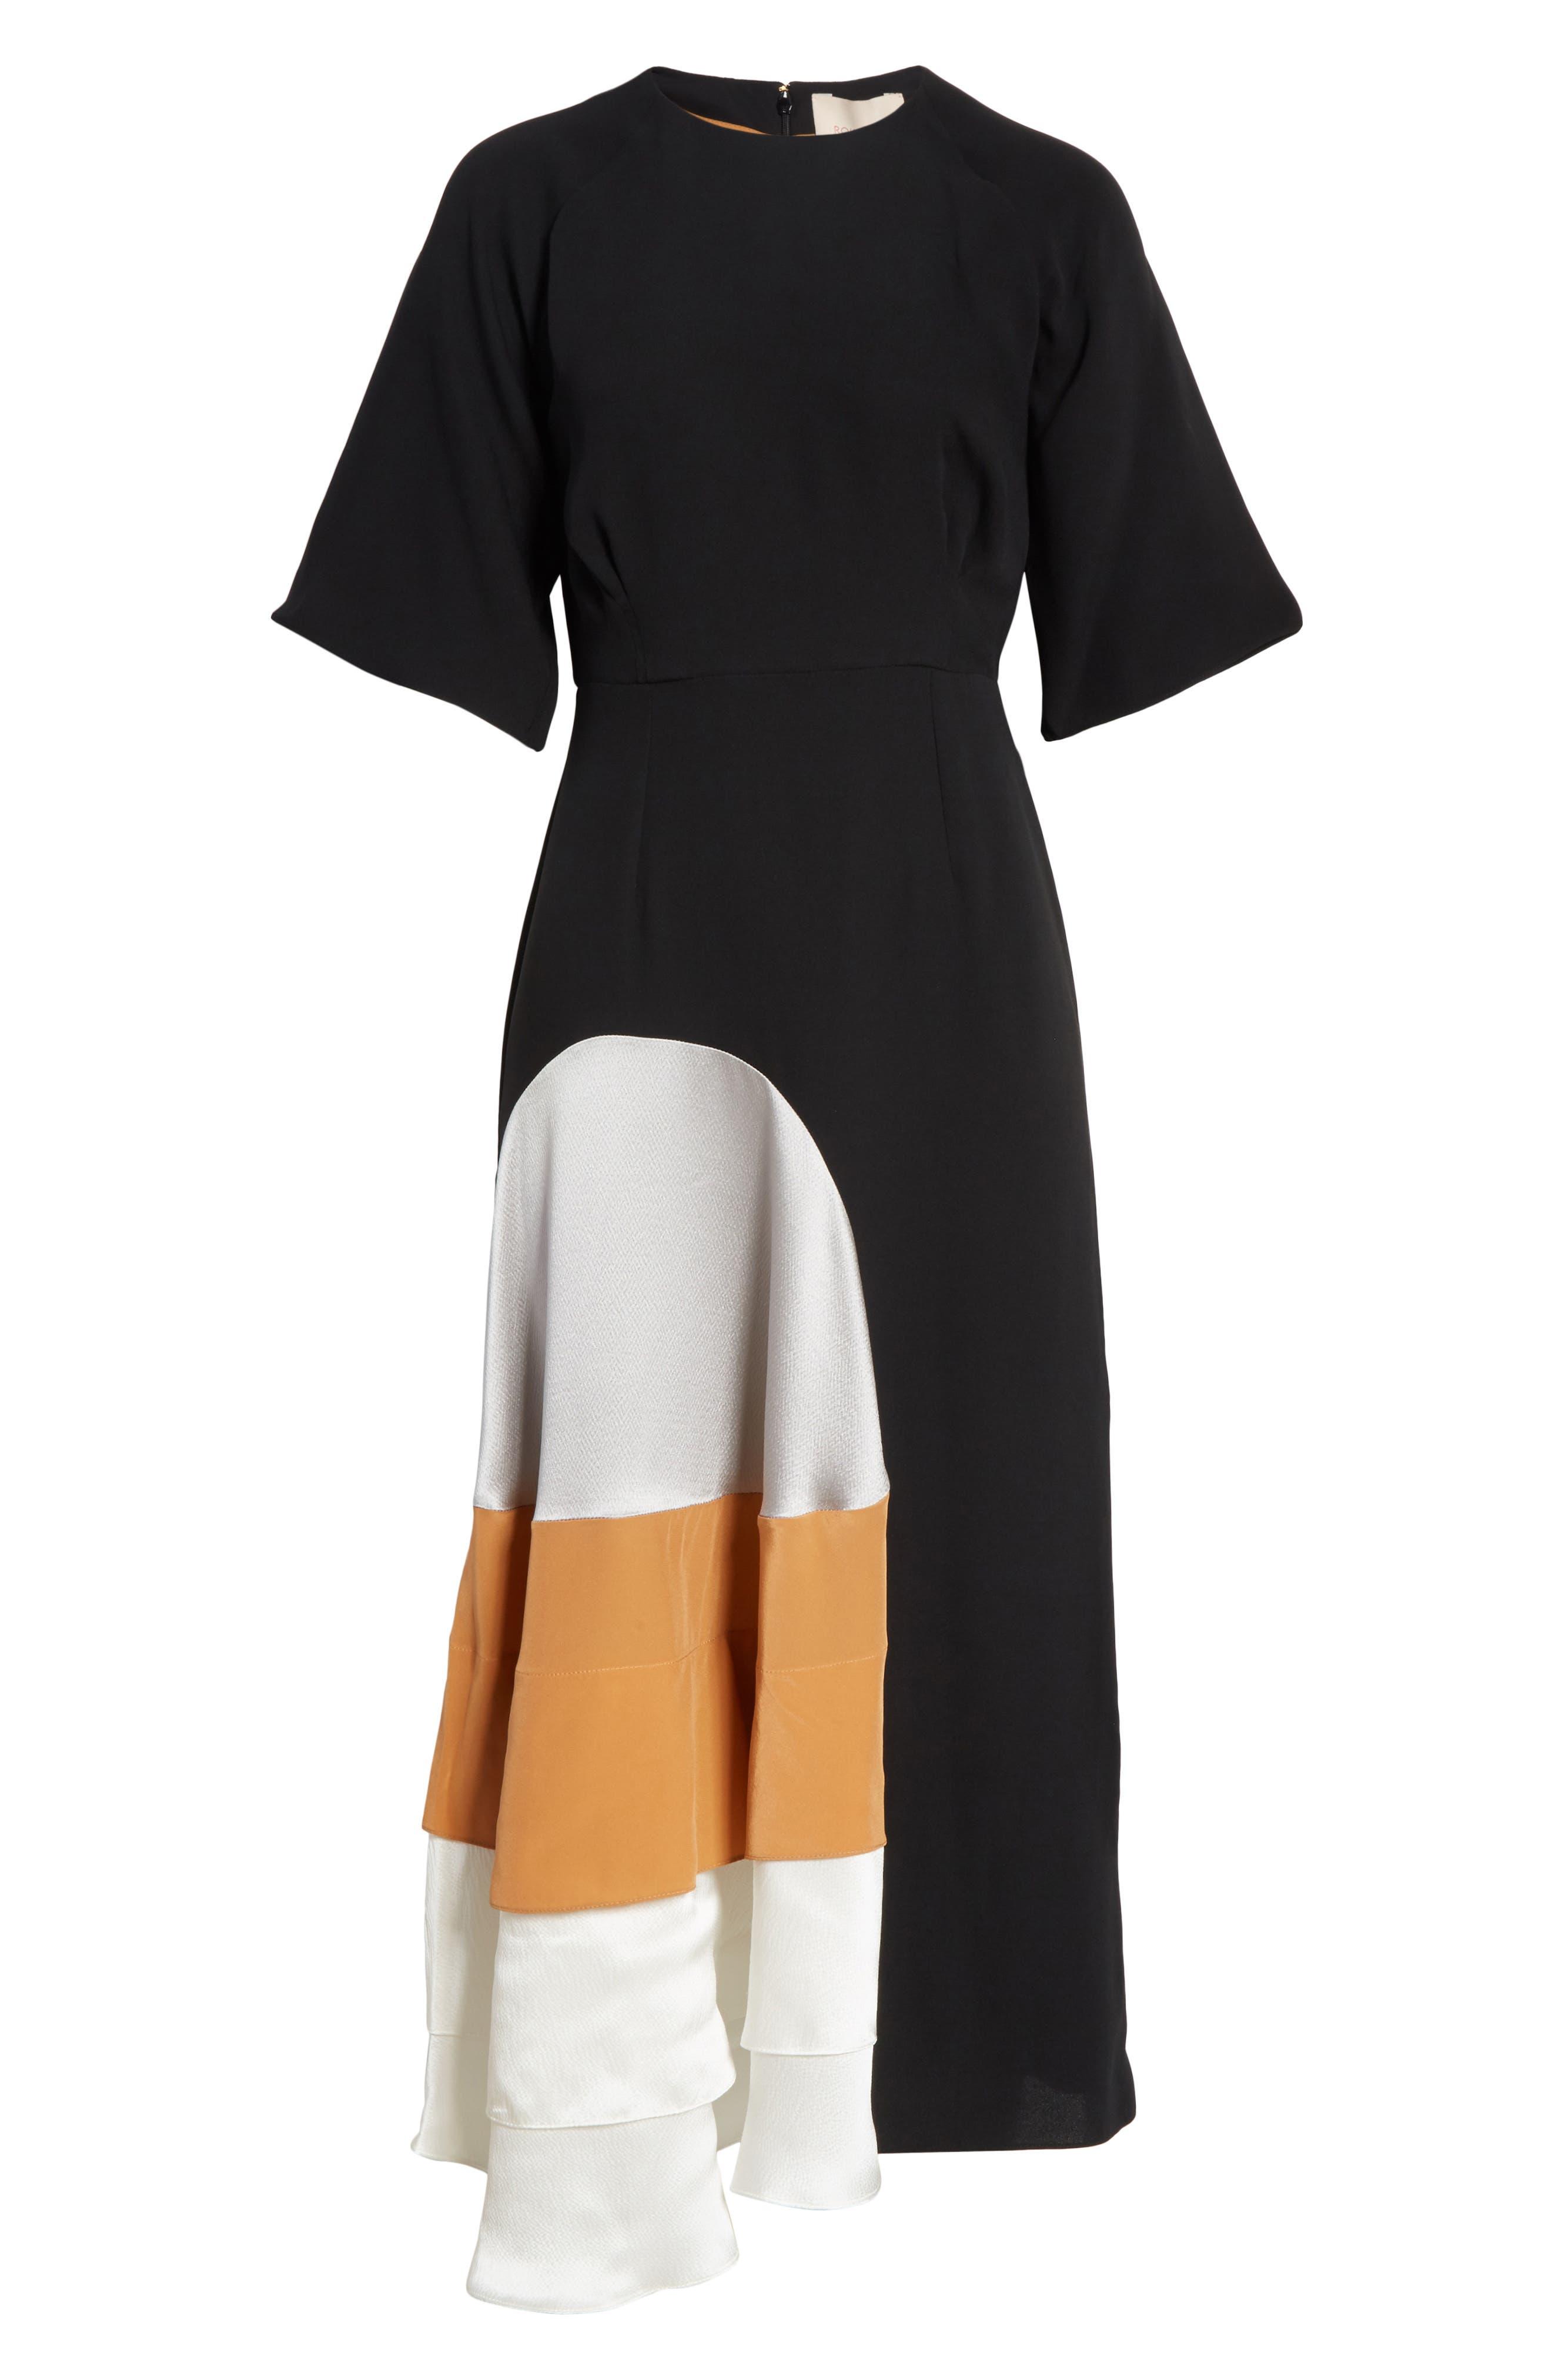 Rauma Silk Dress,                             Alternate thumbnail 7, color,                             Black/ Silver/ Sand/ Ivory